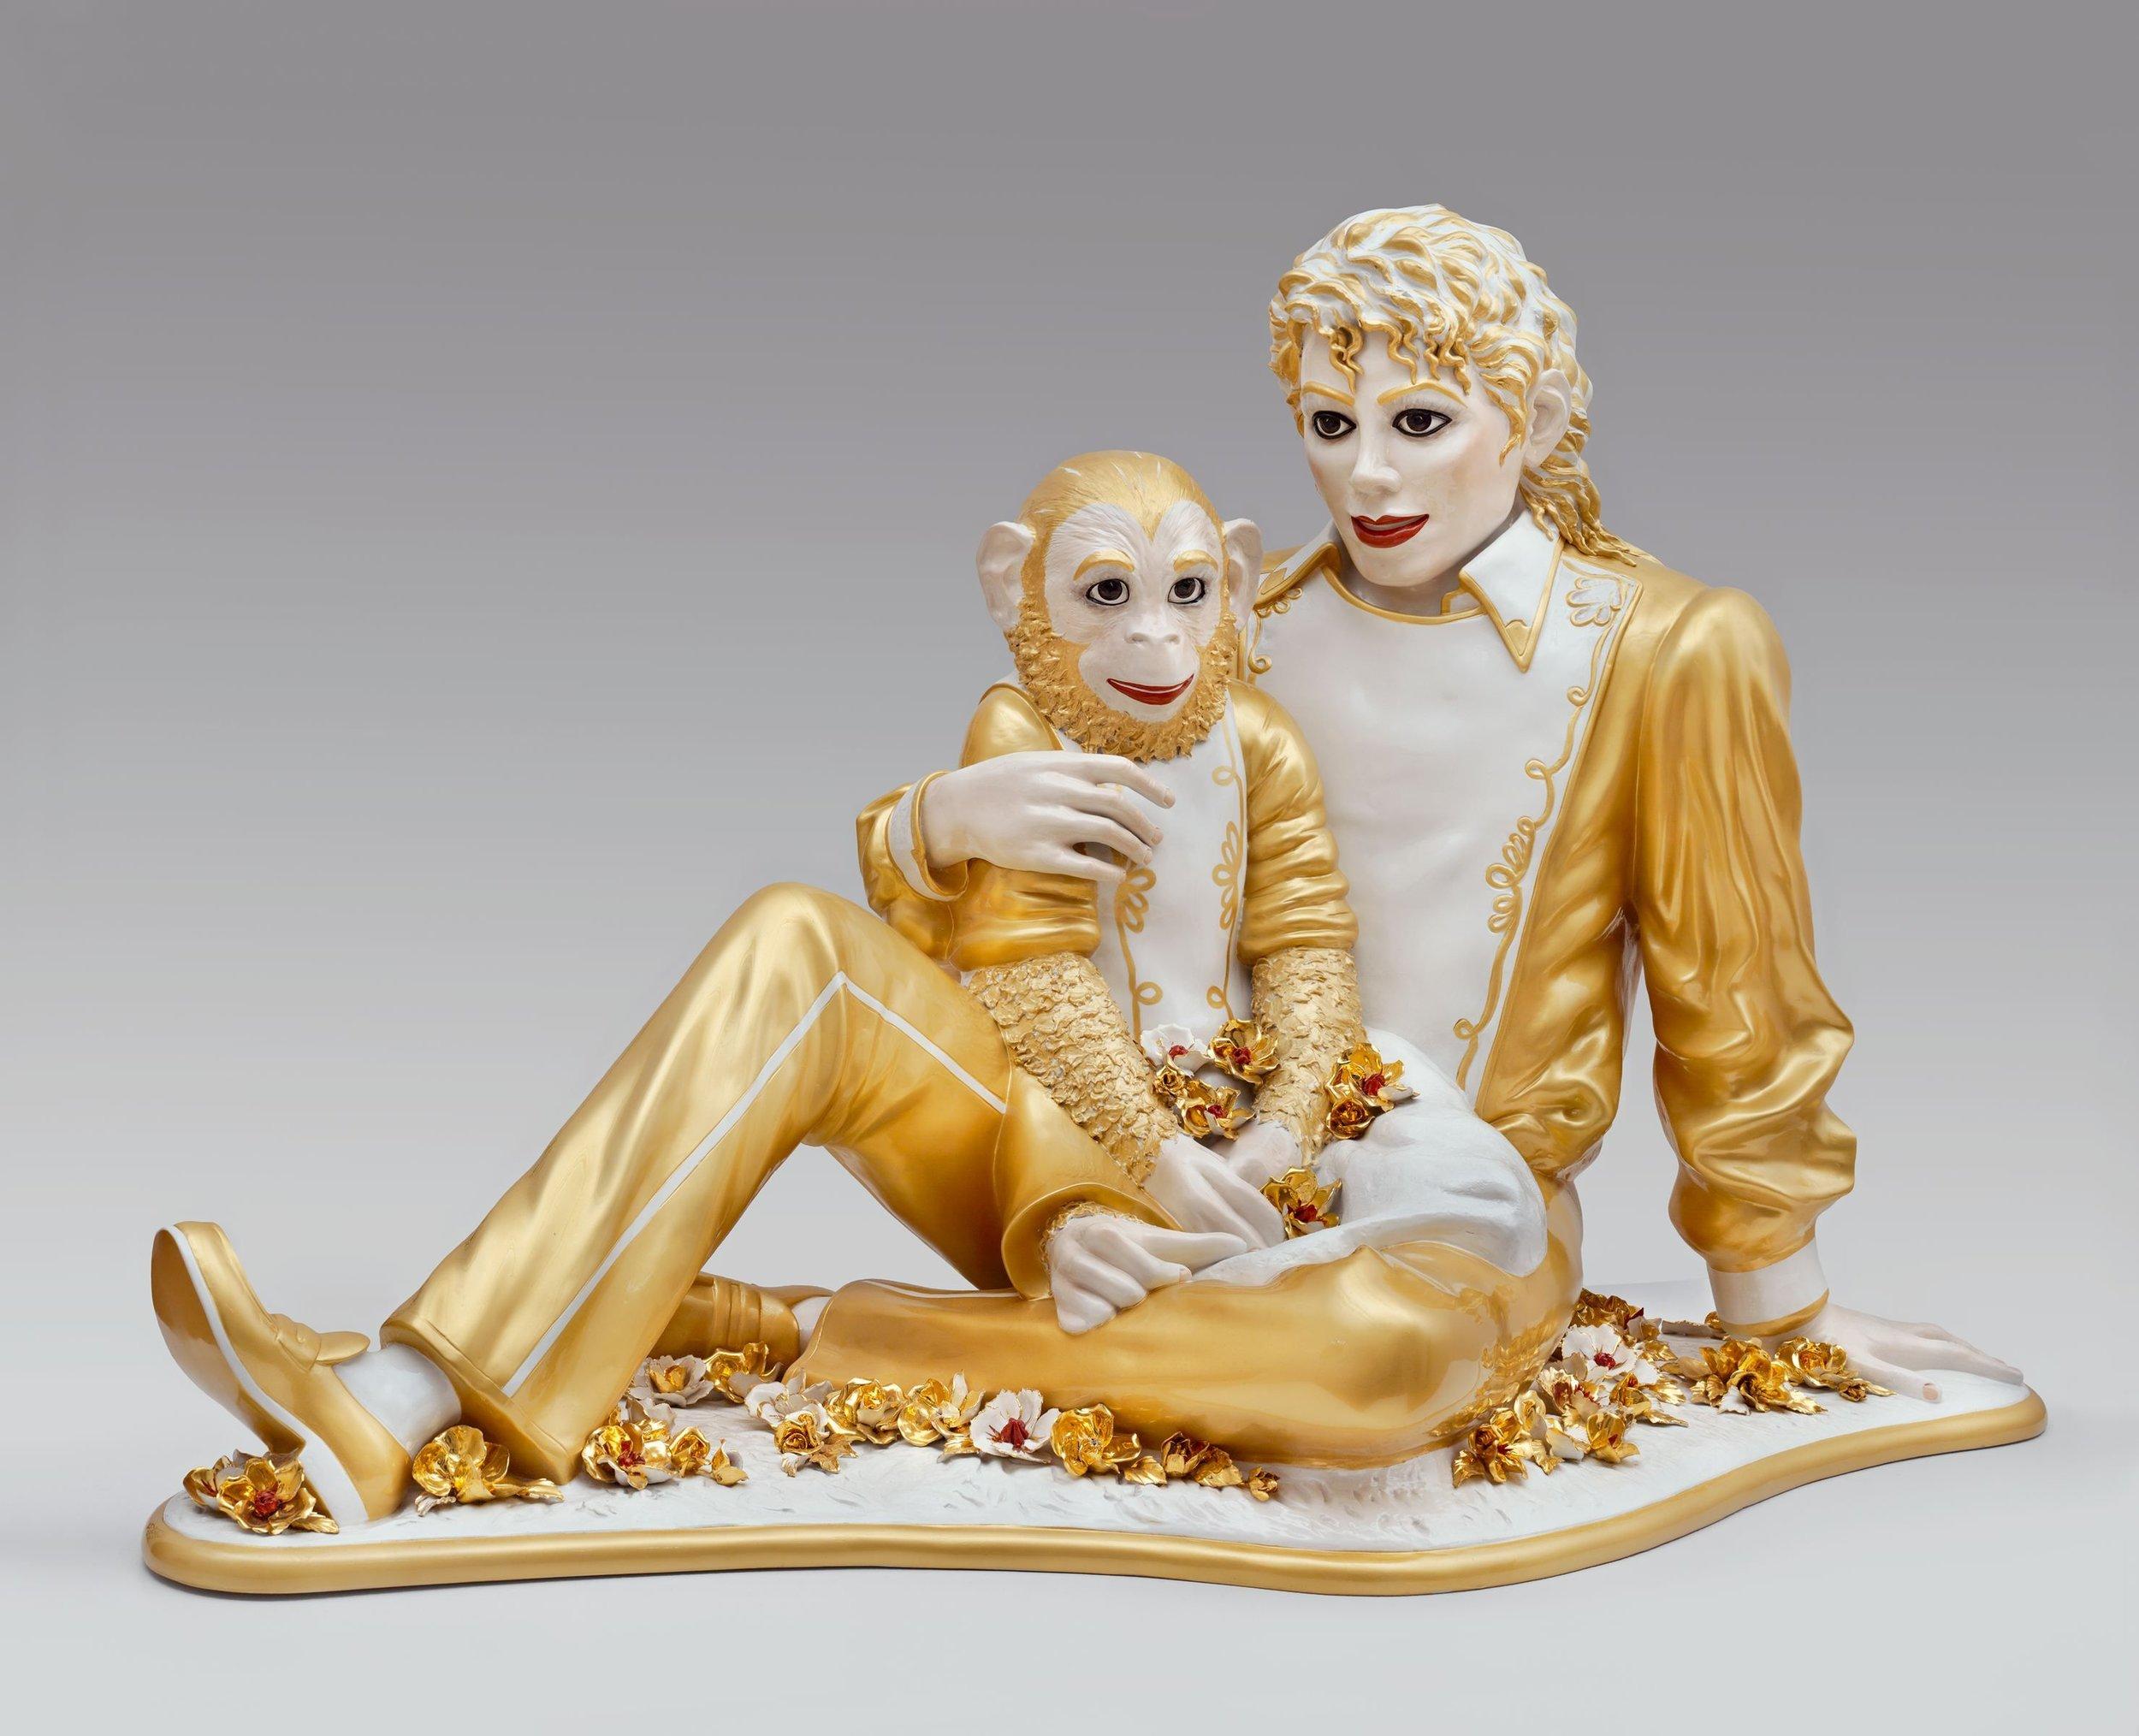 Jeff Koons, Michael Jackson and Bubbles, 1988